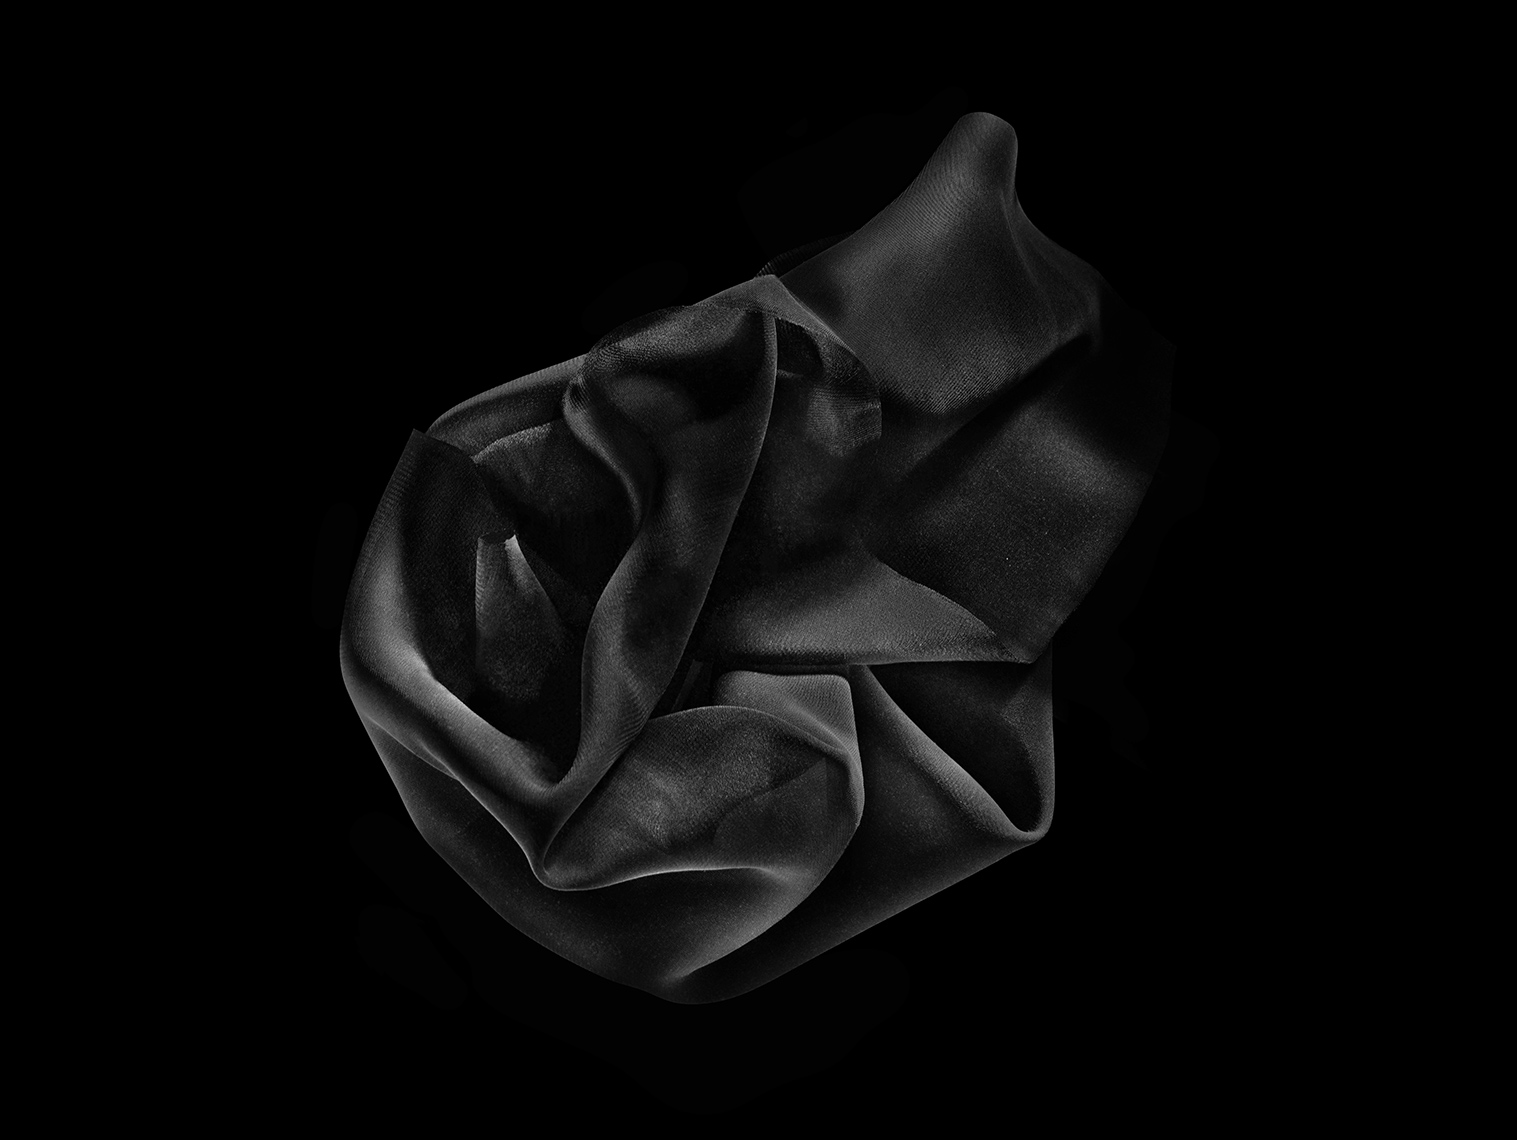 Flowers | Black